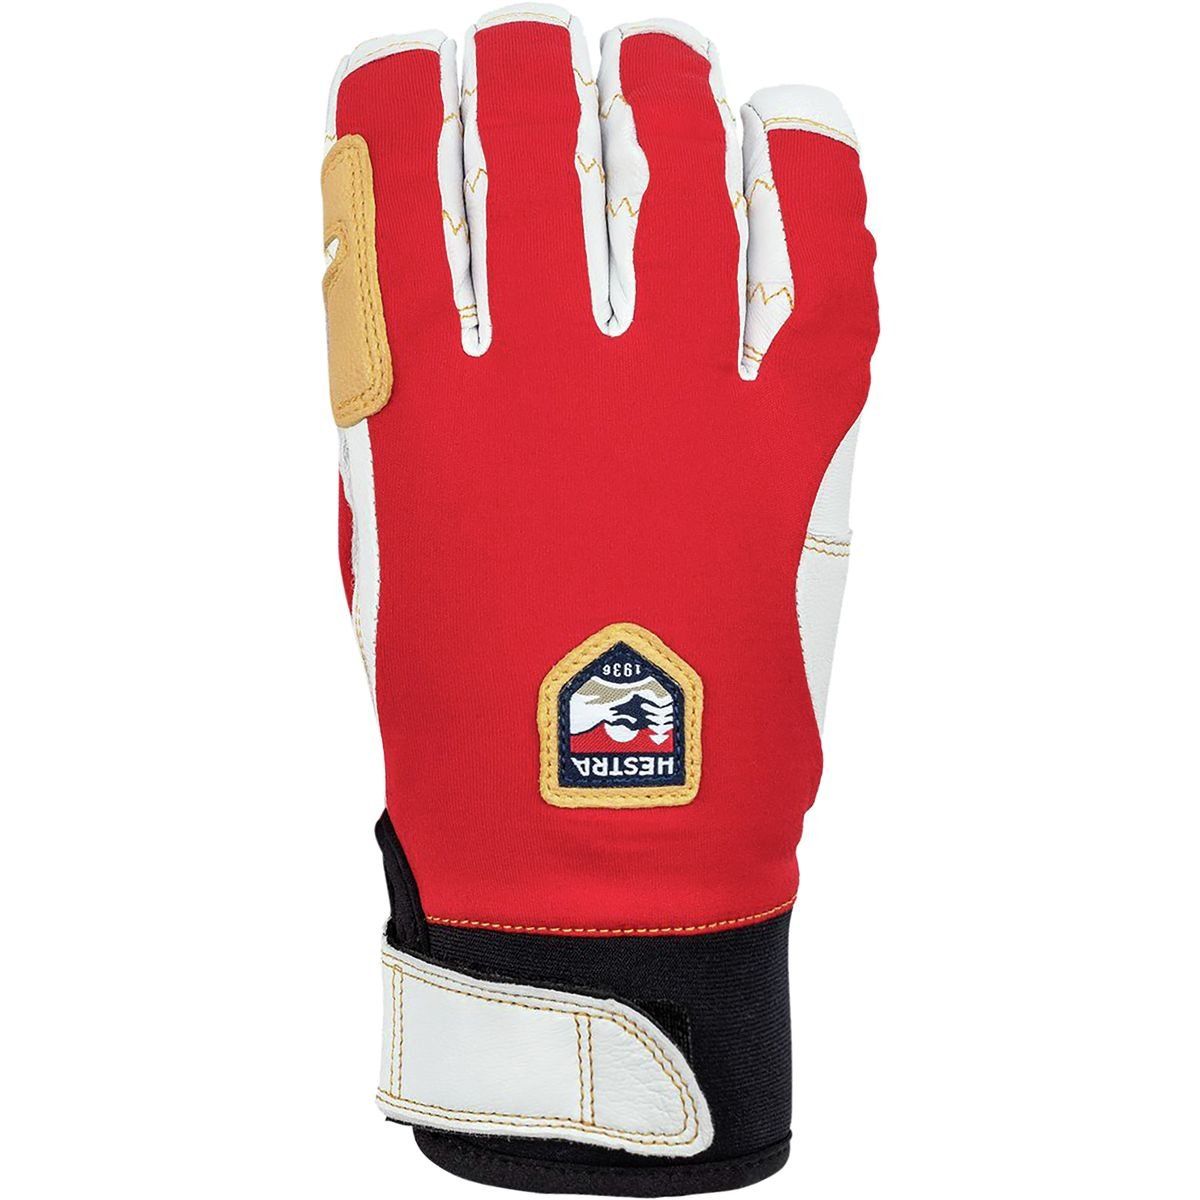 Hestra Ergo Grip Active 5 Finger ROT/OffWeiß